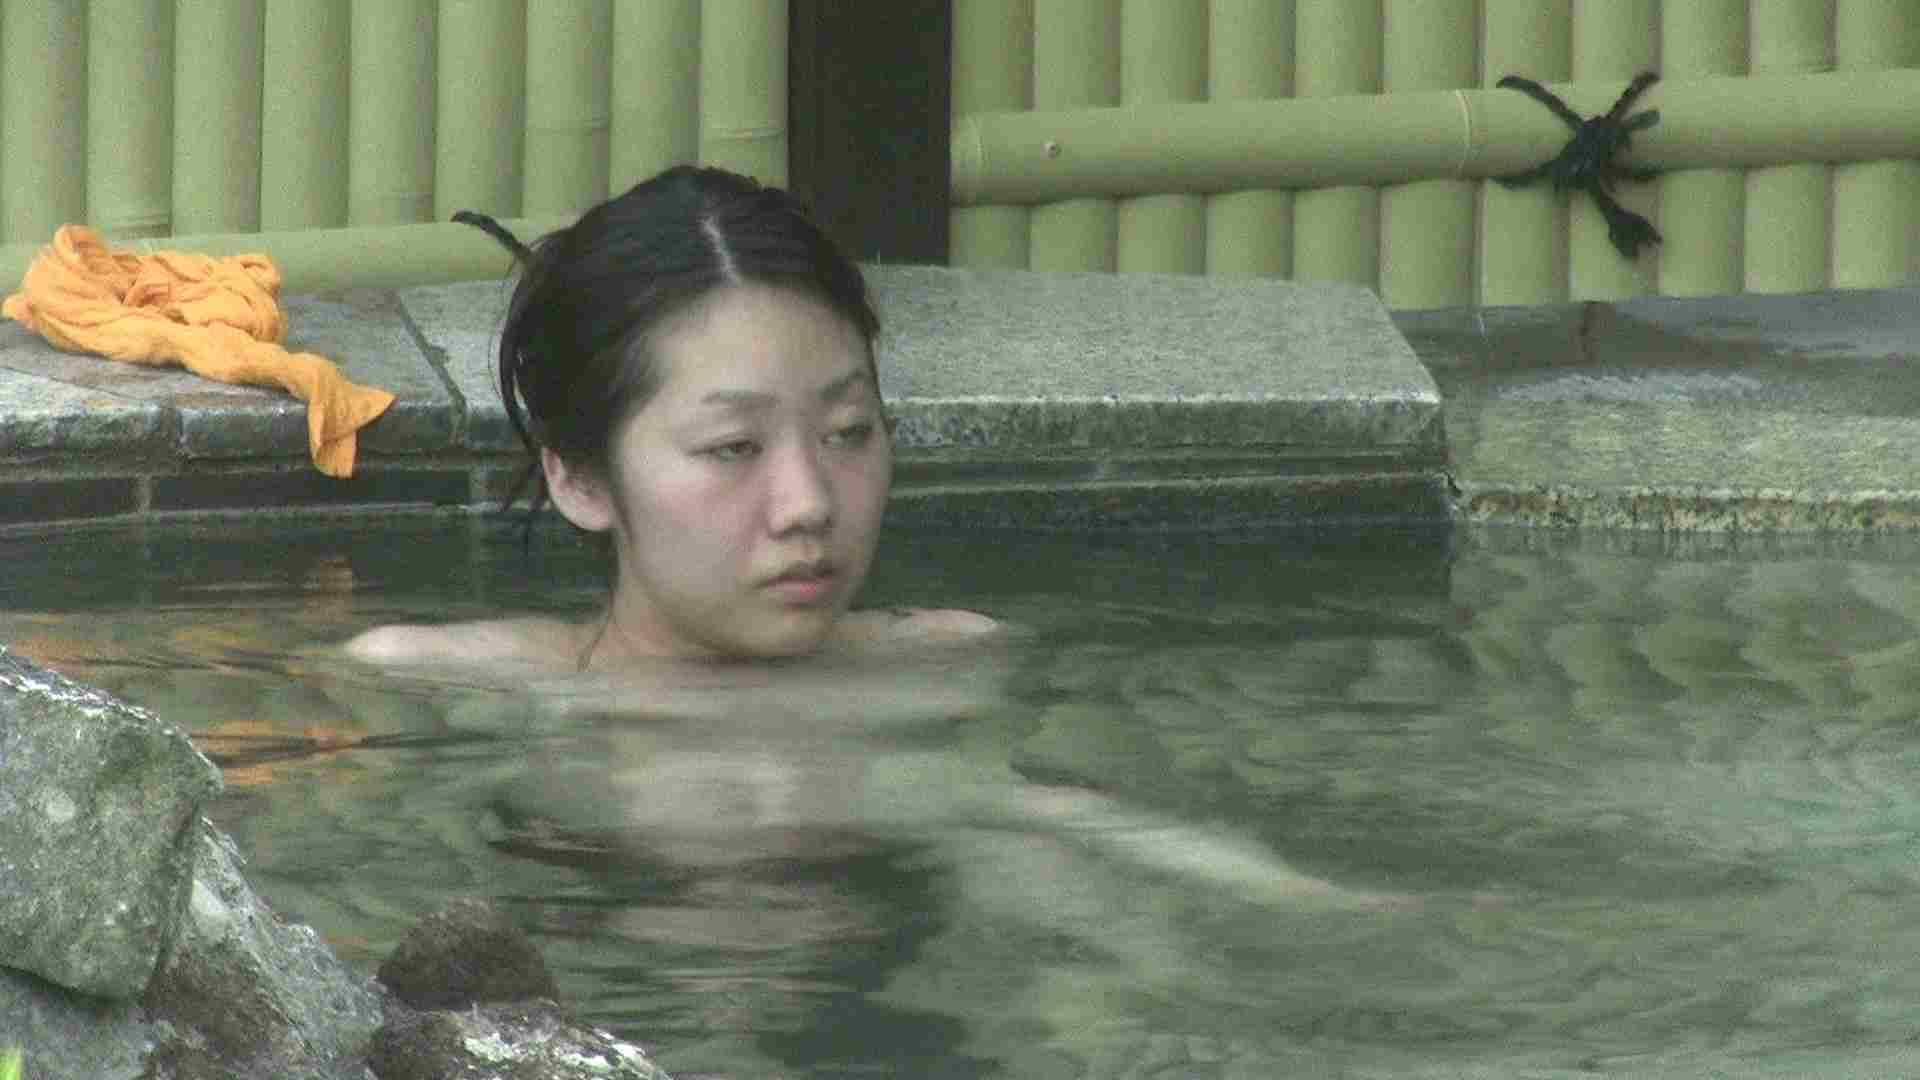 Aquaな露天風呂Vol.194 露天風呂編  110PIX 24